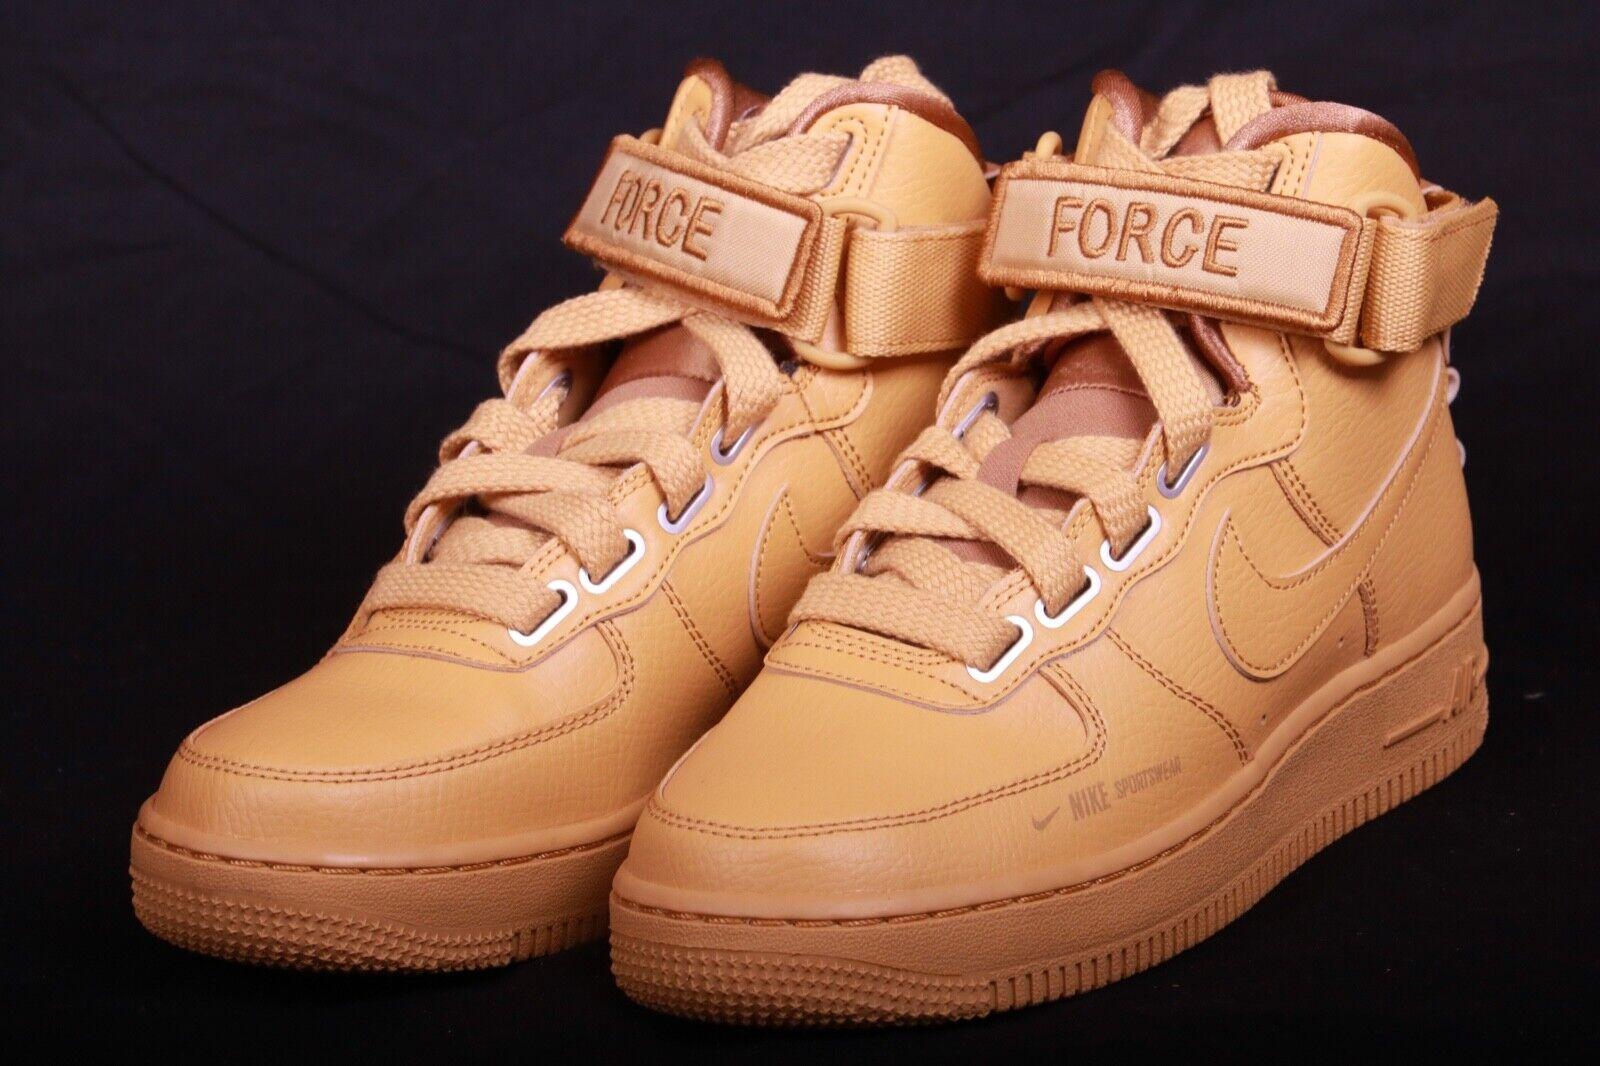 Nike Women's Air Force 1 High Utility shoes gold Bronze AJ7311 700 Size 6